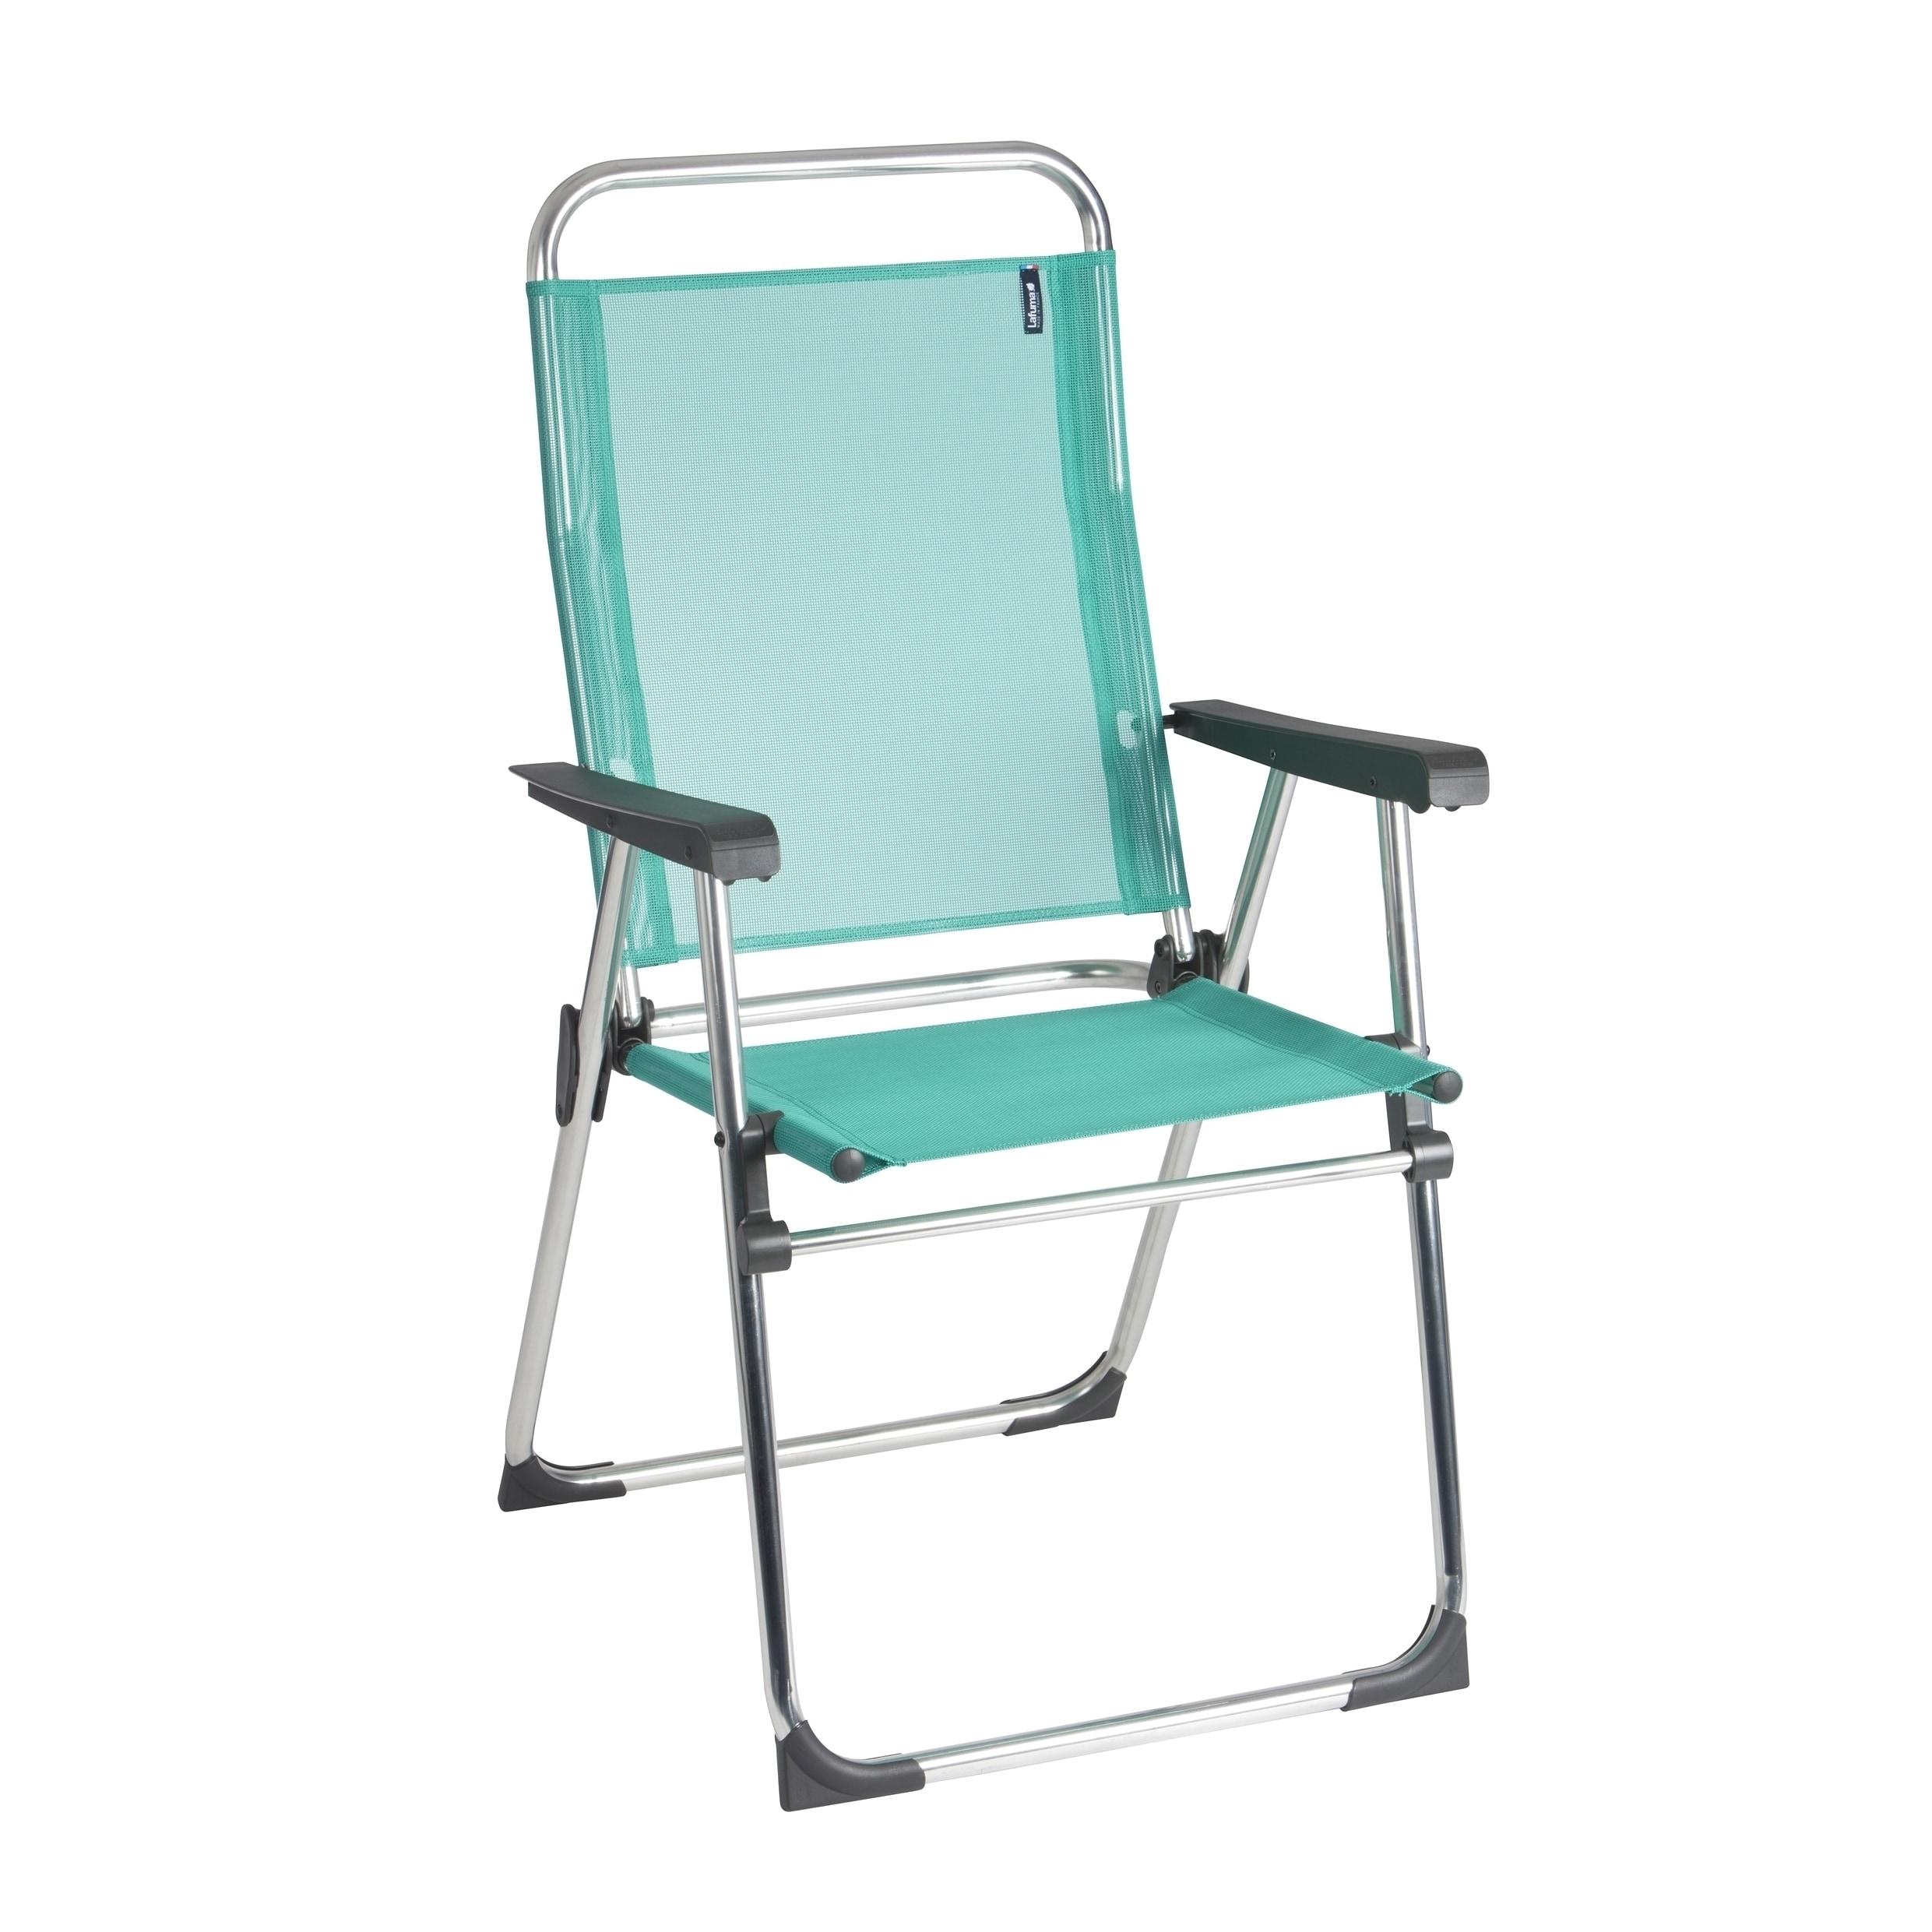 Lafuma Victoria Alu brut Aluminum Frame Folding Chair wit...